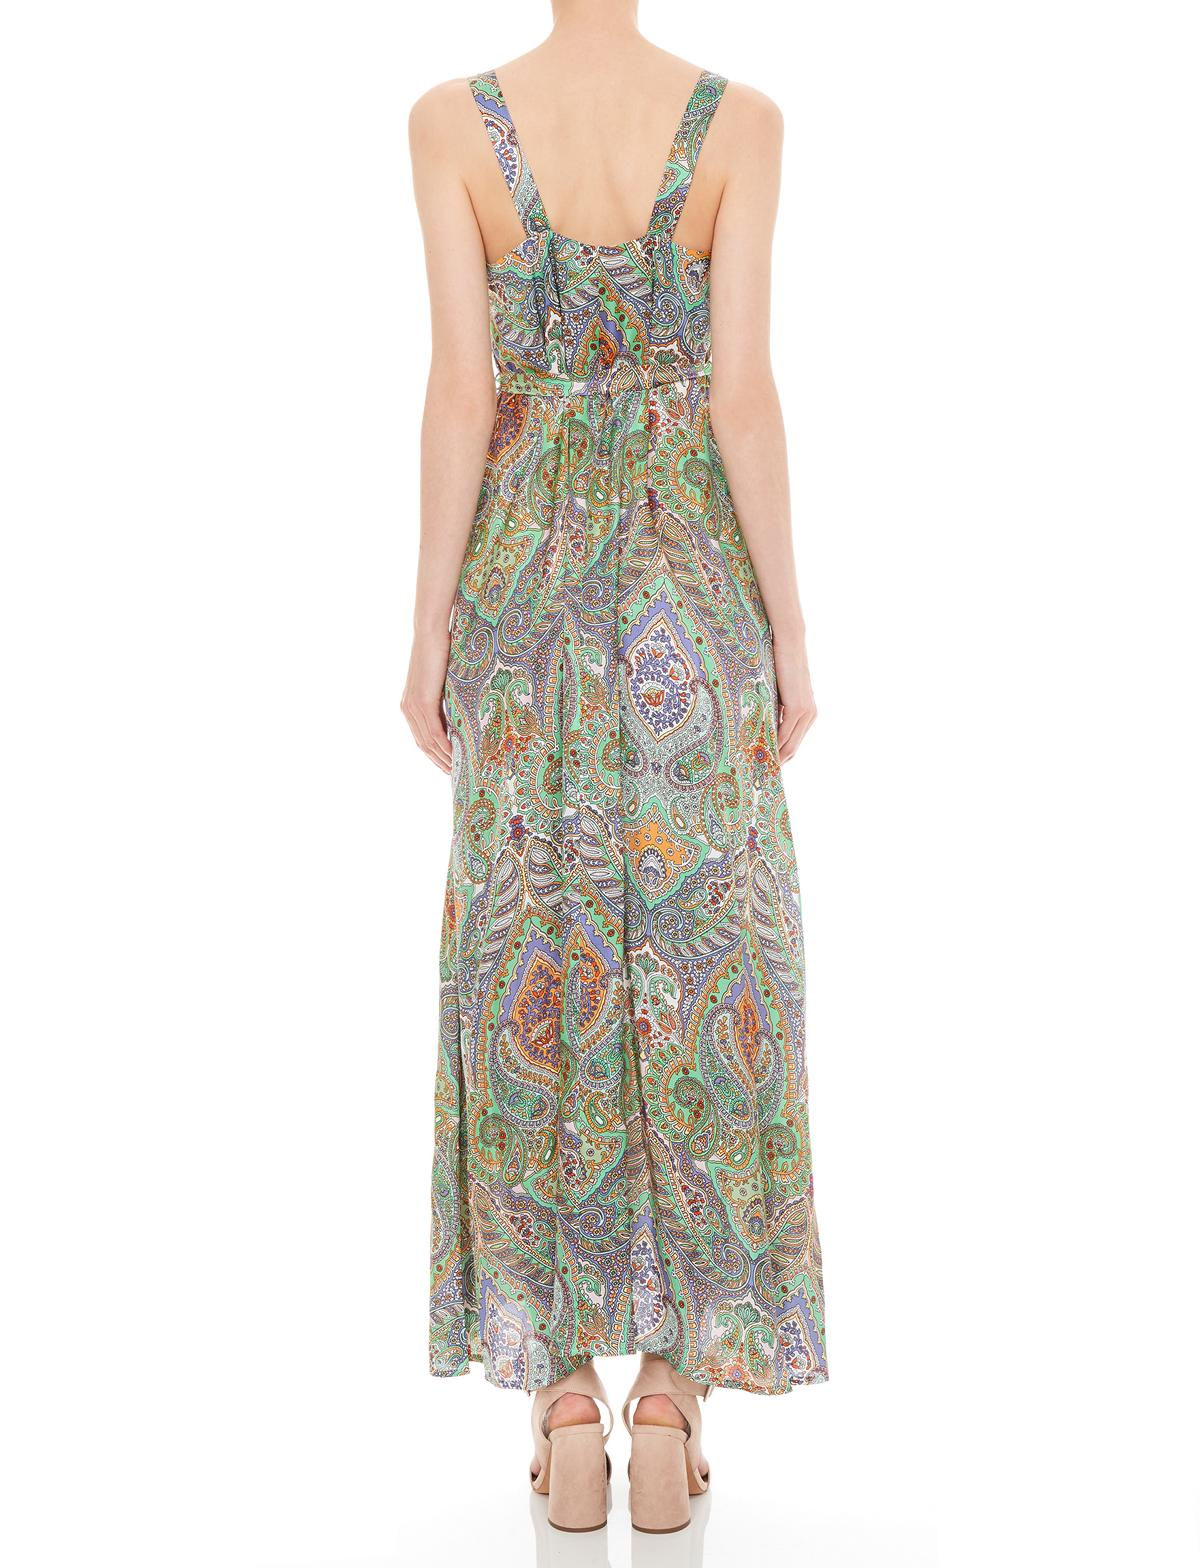 Rückansicht von Ana Alcazar Maxi Kleid Moanita  angezogen an Model